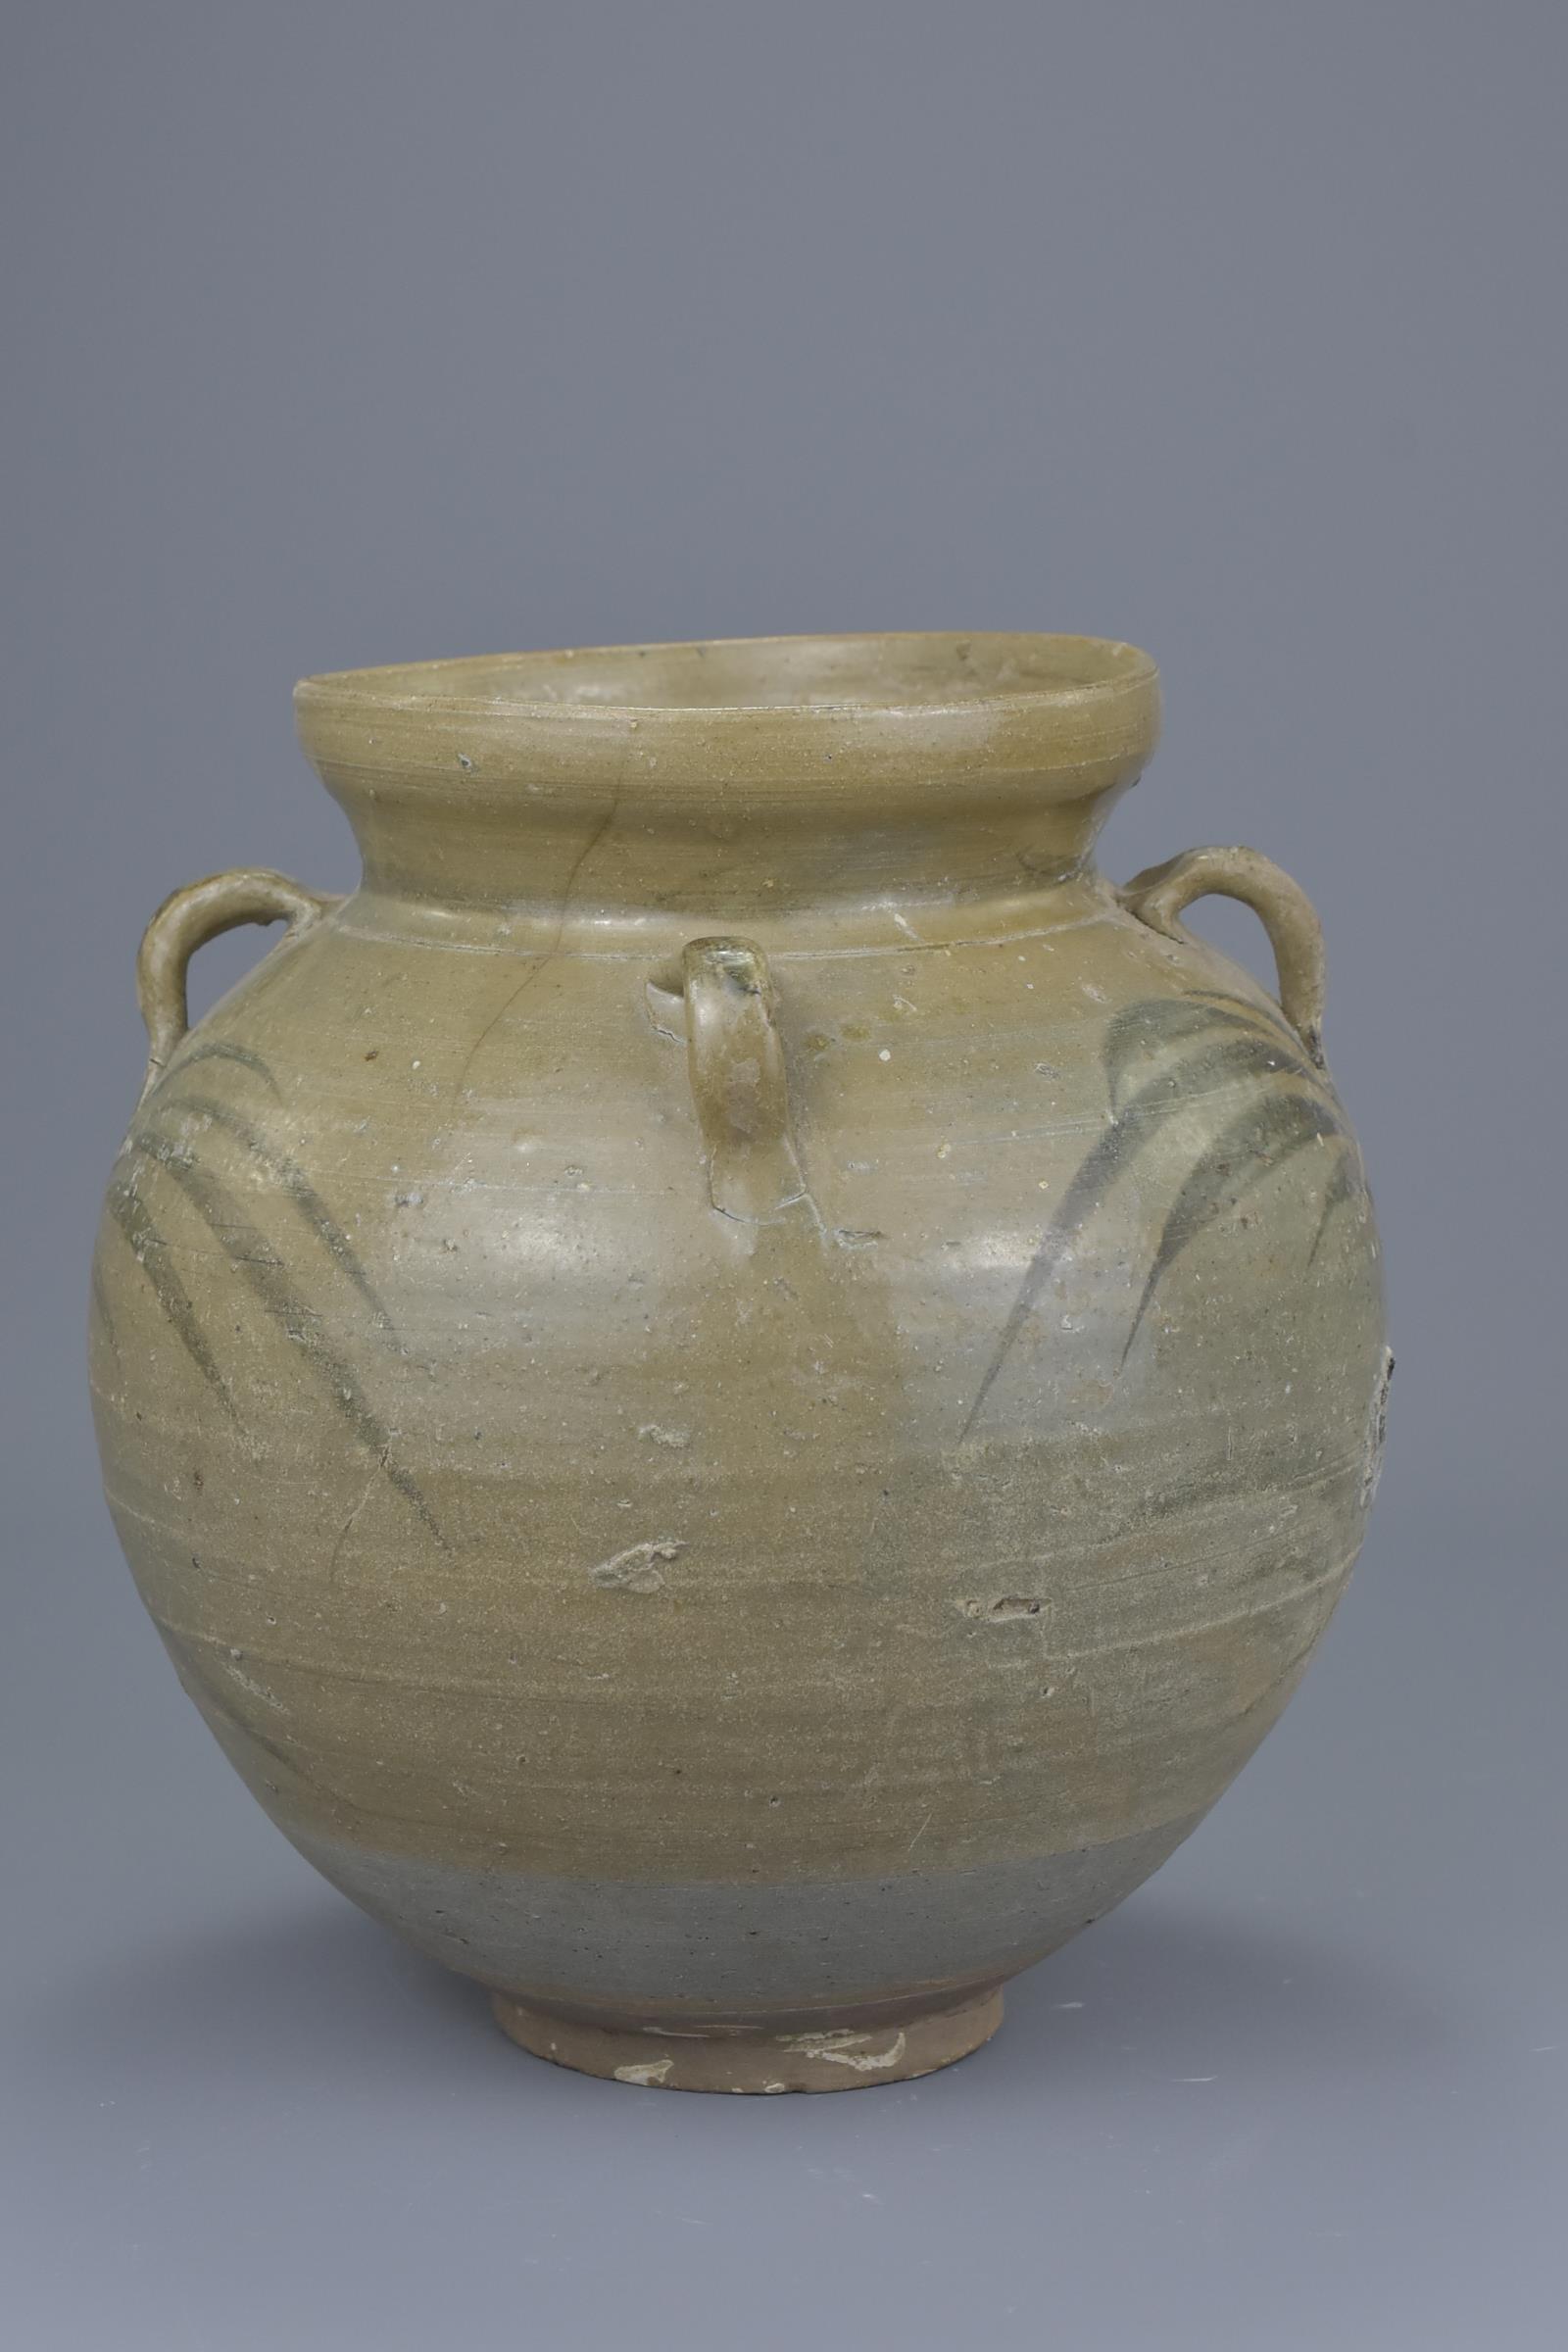 Lot 16 - A Rare Chinese Yuan Dynasty Underglazed Jar